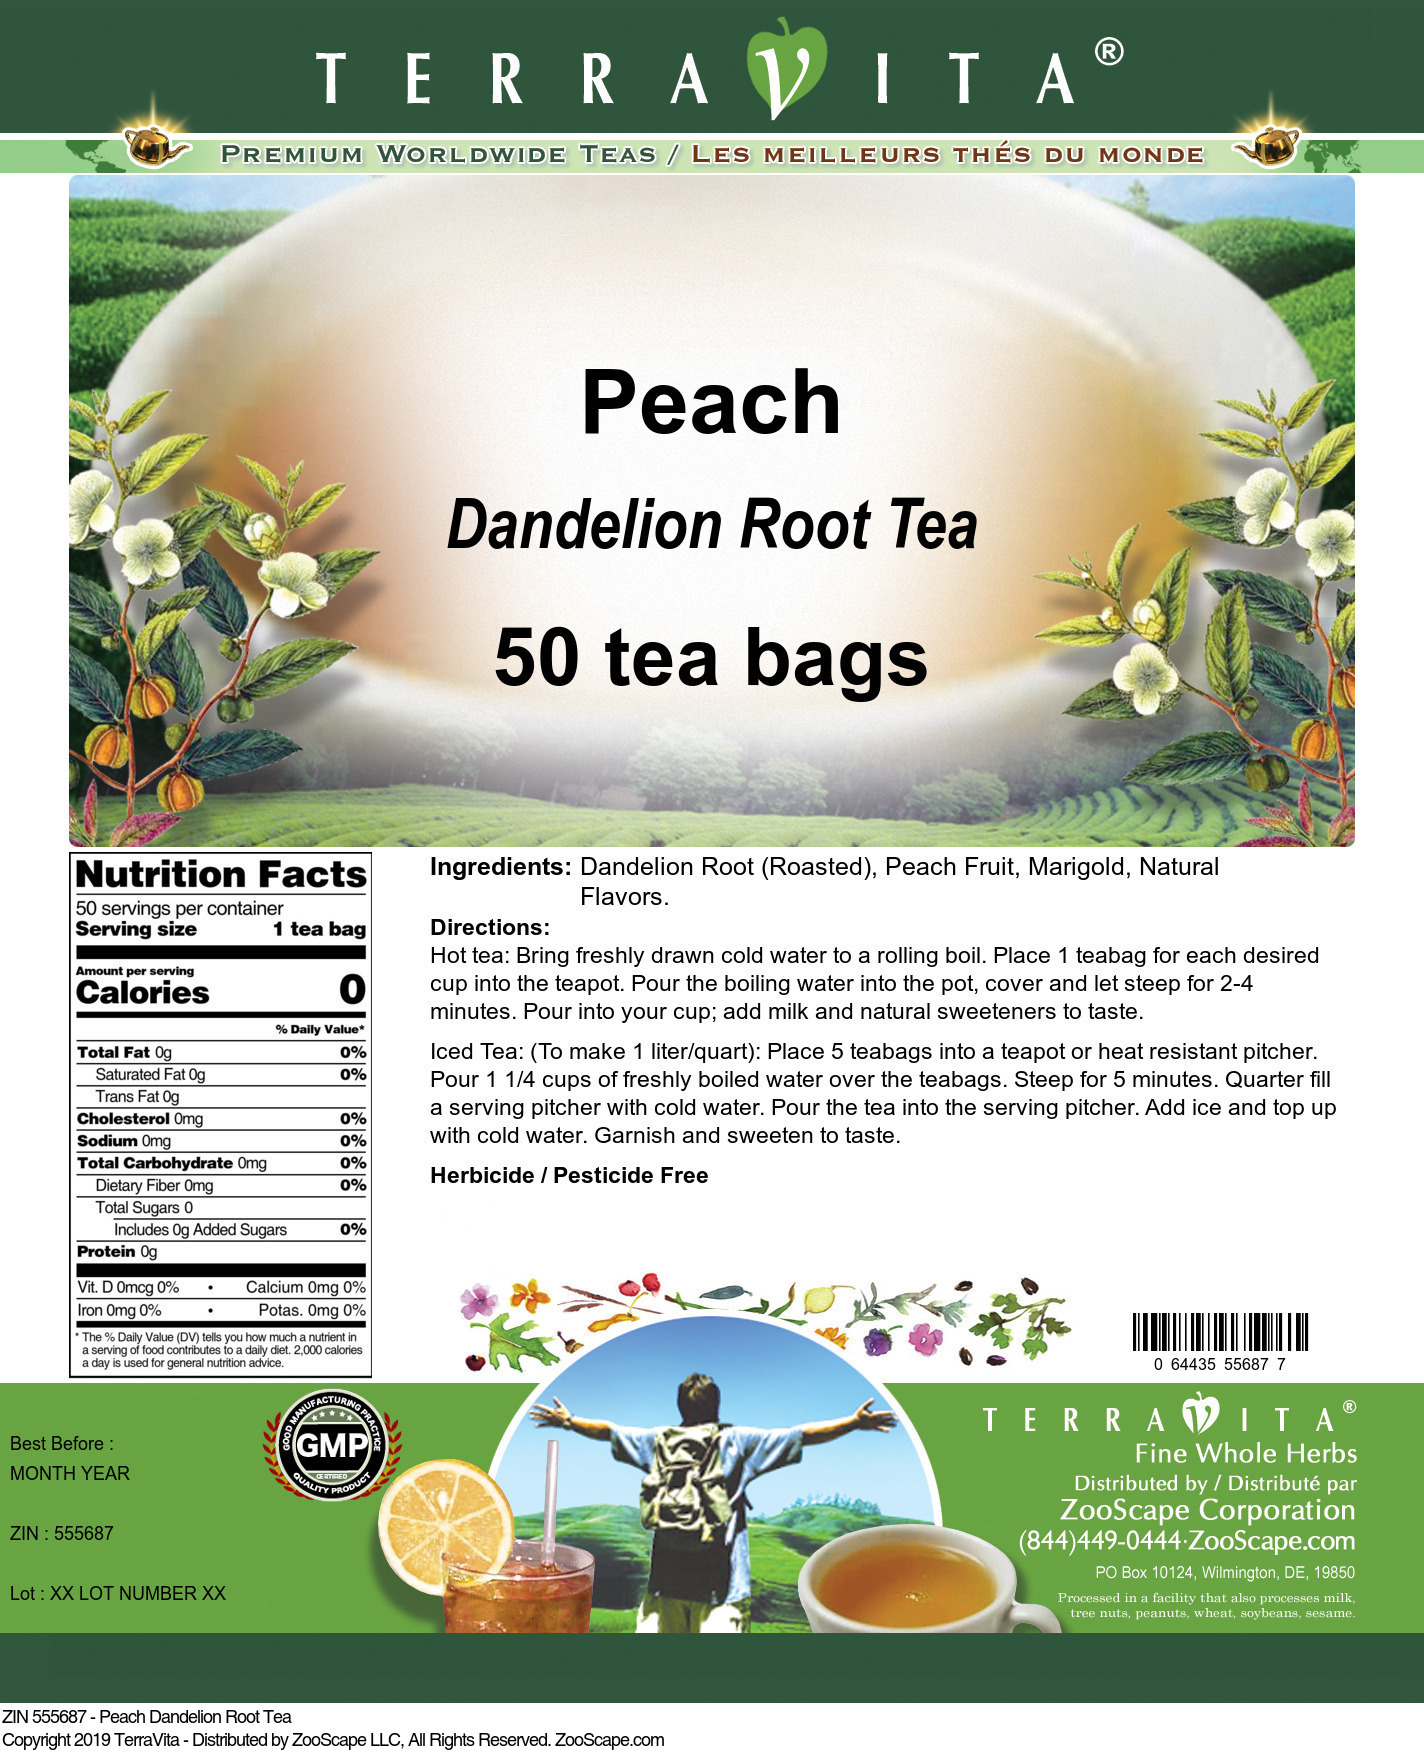 Peach Dandelion Root Tea